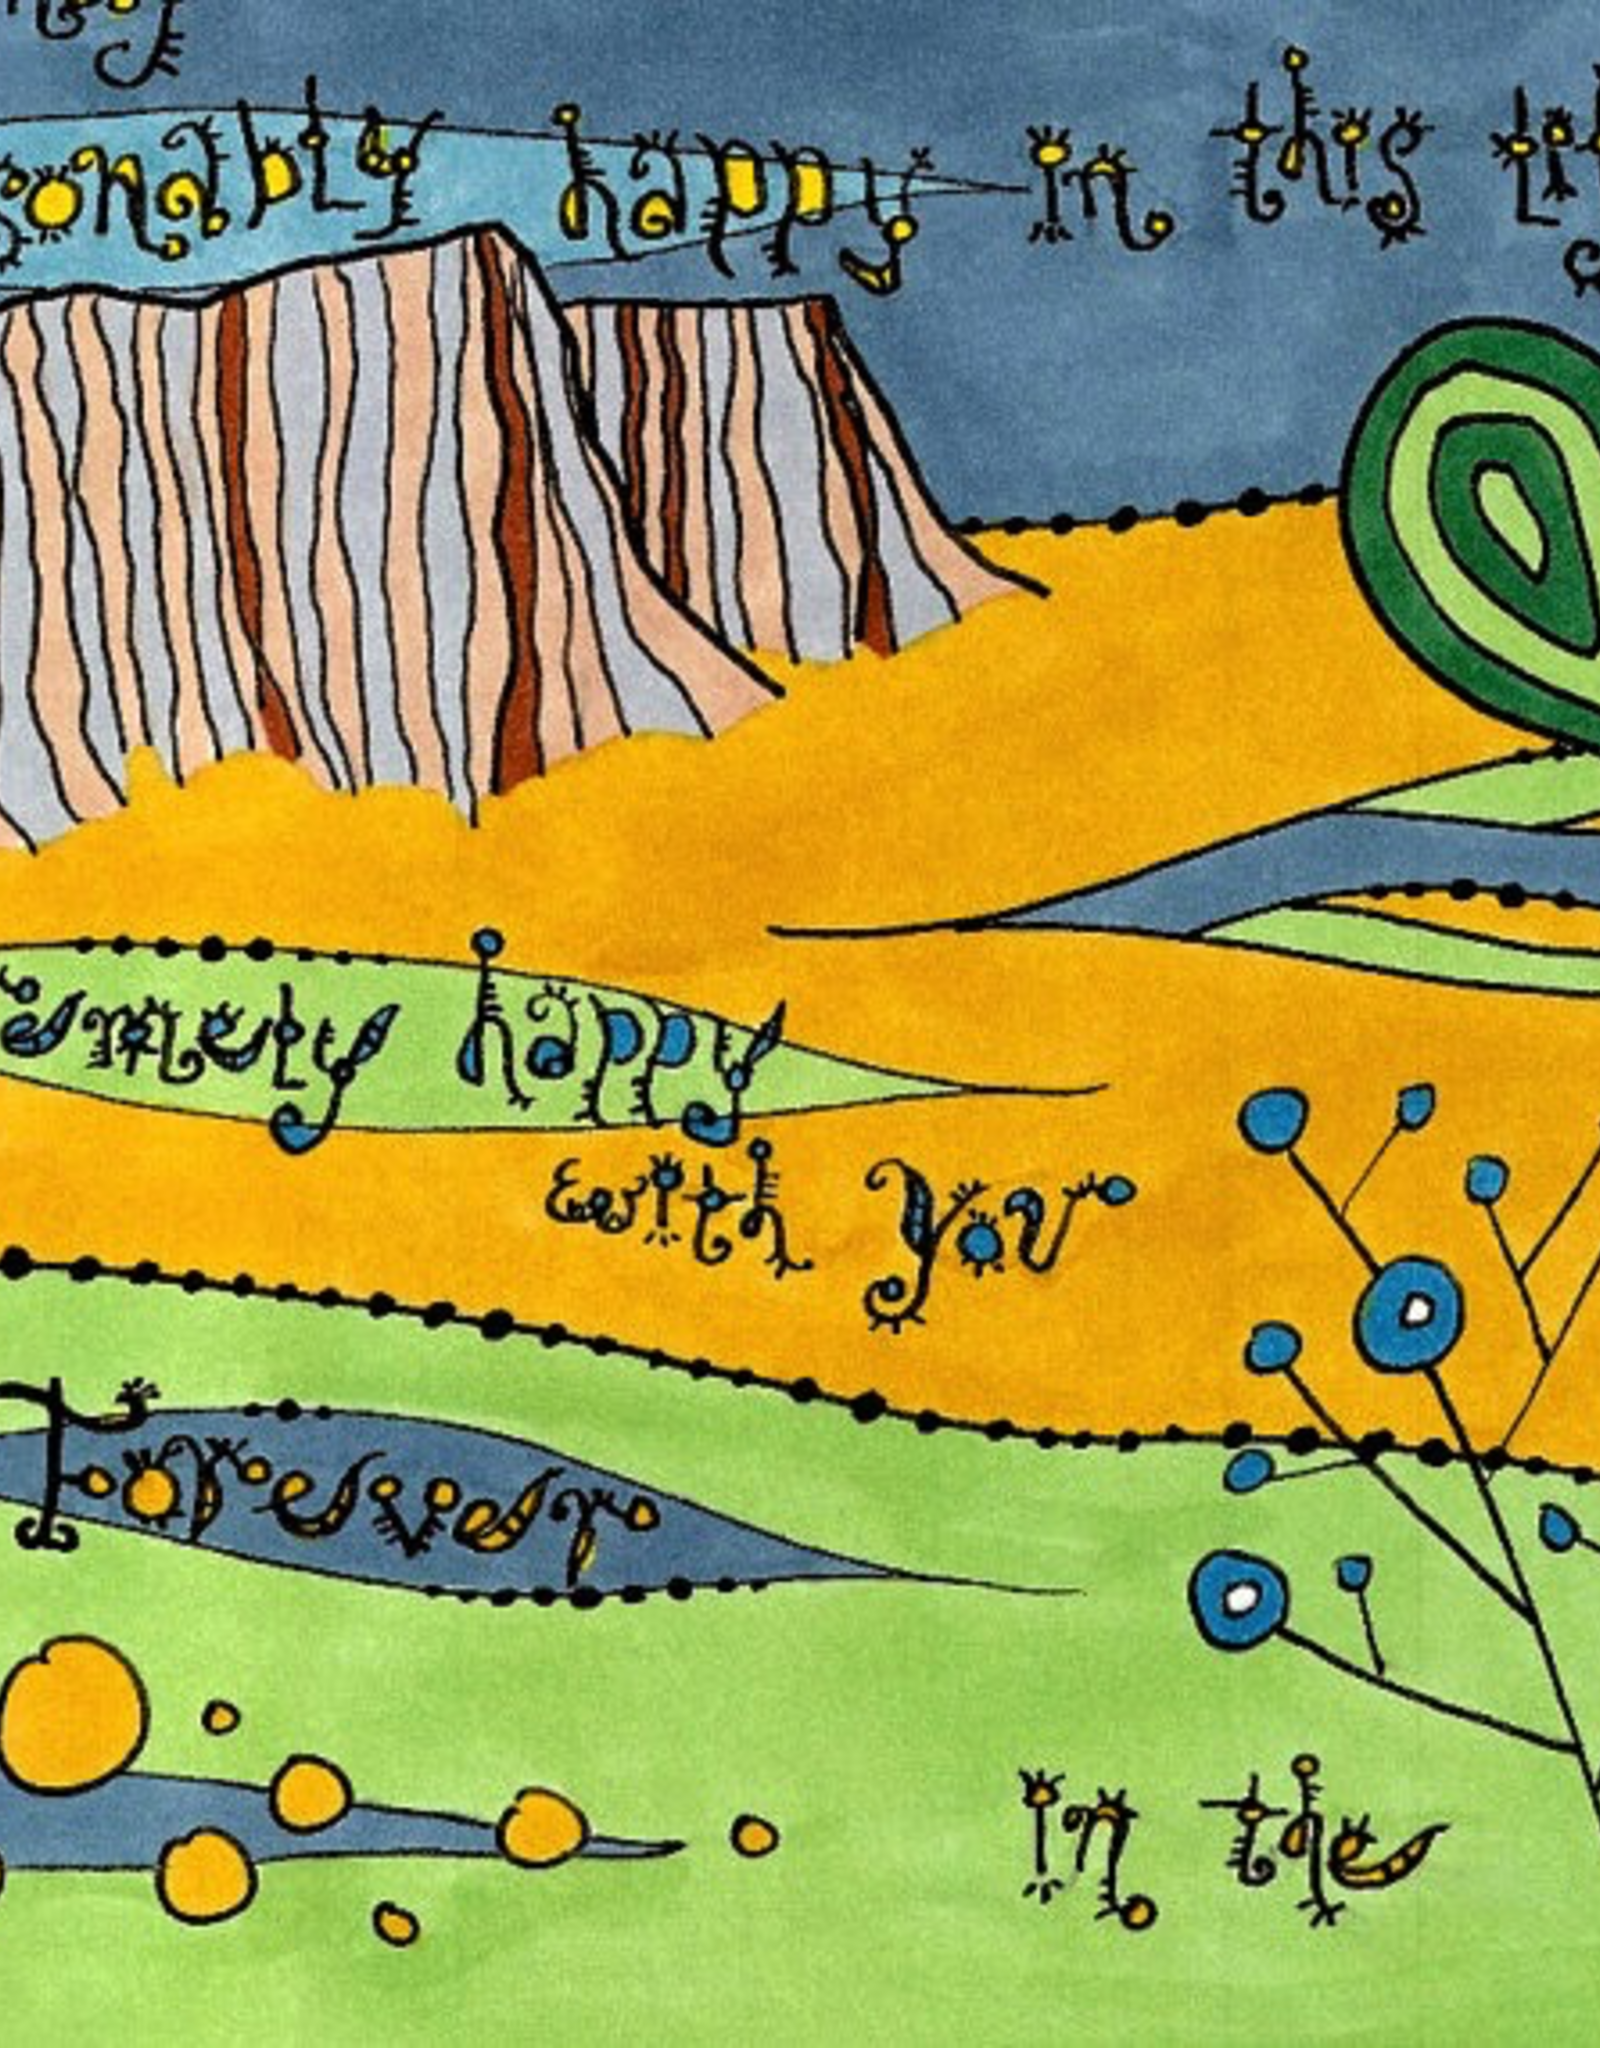 Dovetail Ink Dovetail Ink:  Serenity Prayer Part 3 (12x12 print)